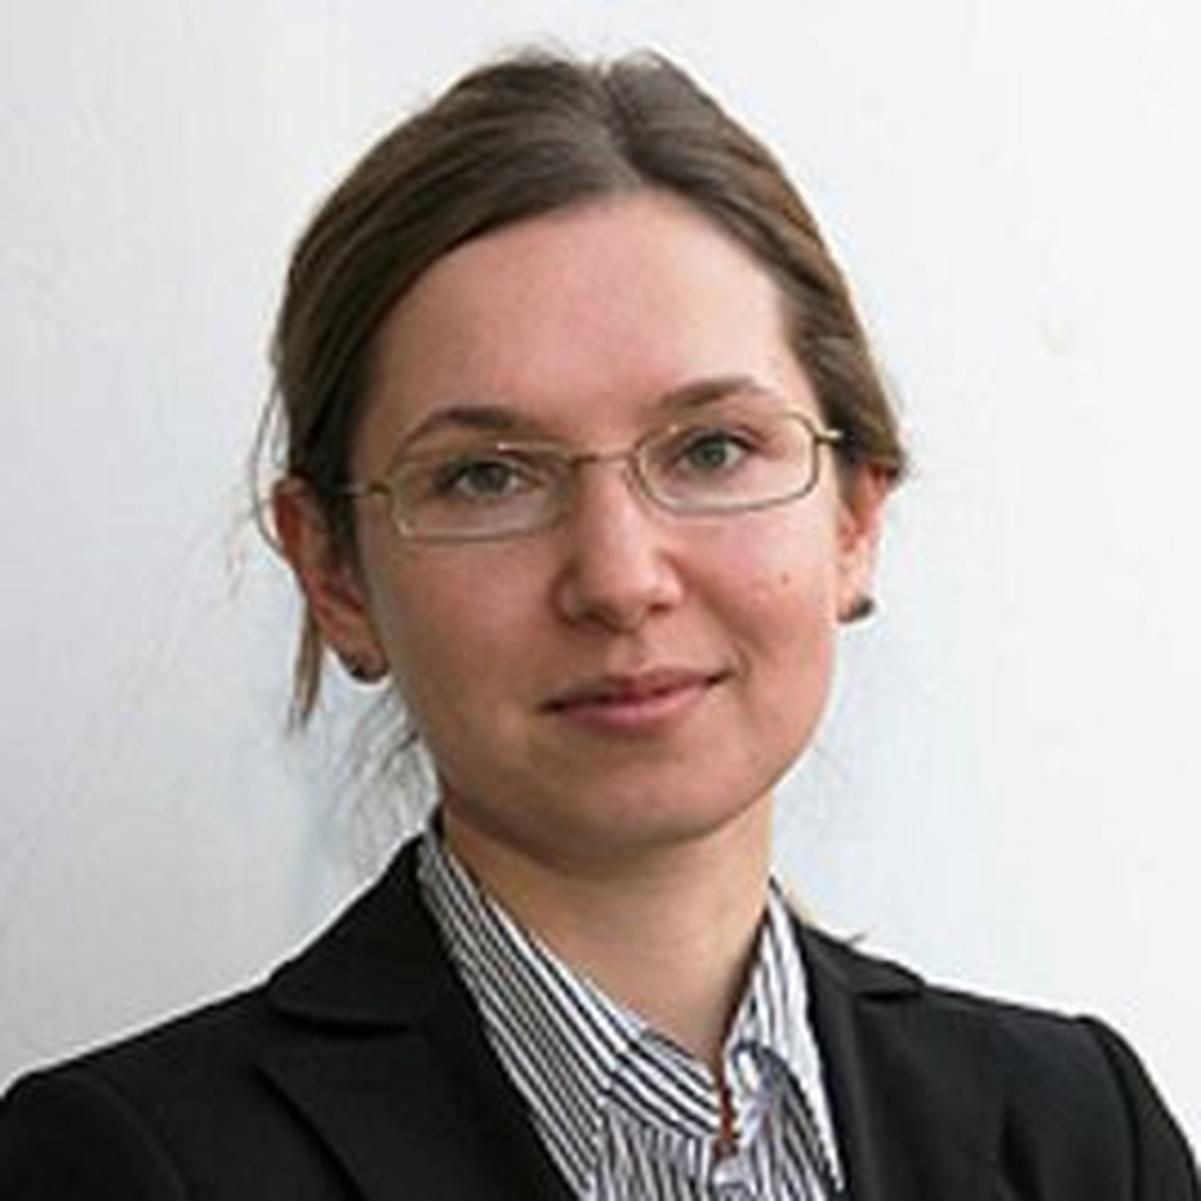 Victoria Ivashina